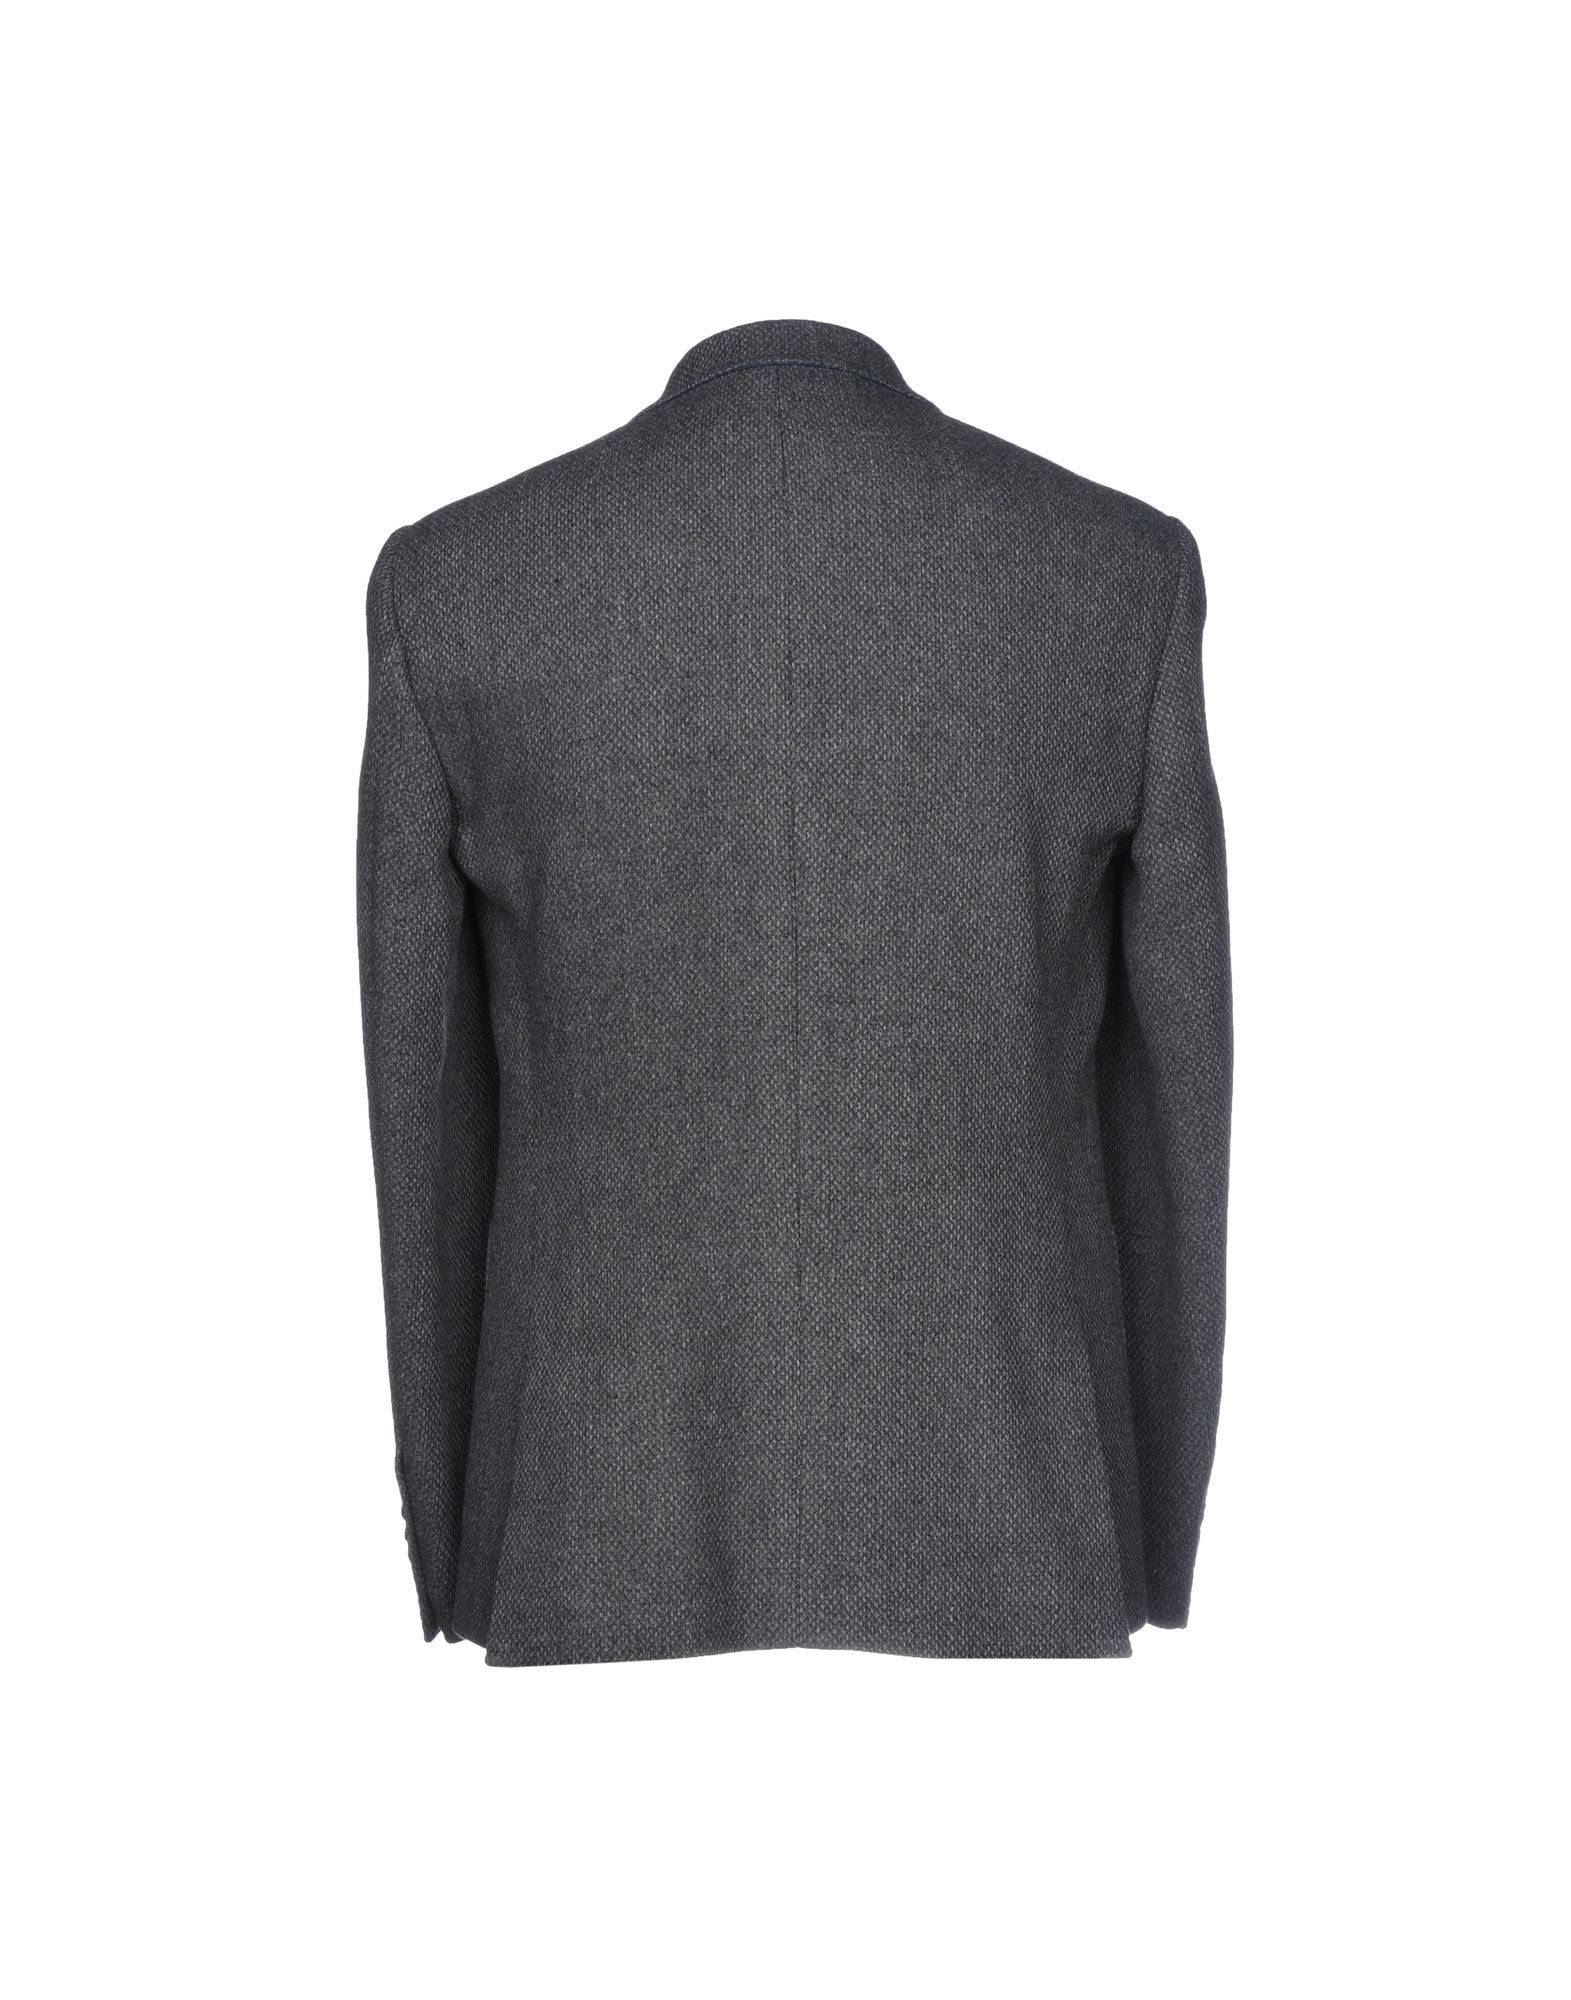 Harry & Sons Lead Virgin Wool Single Breasted Jacket